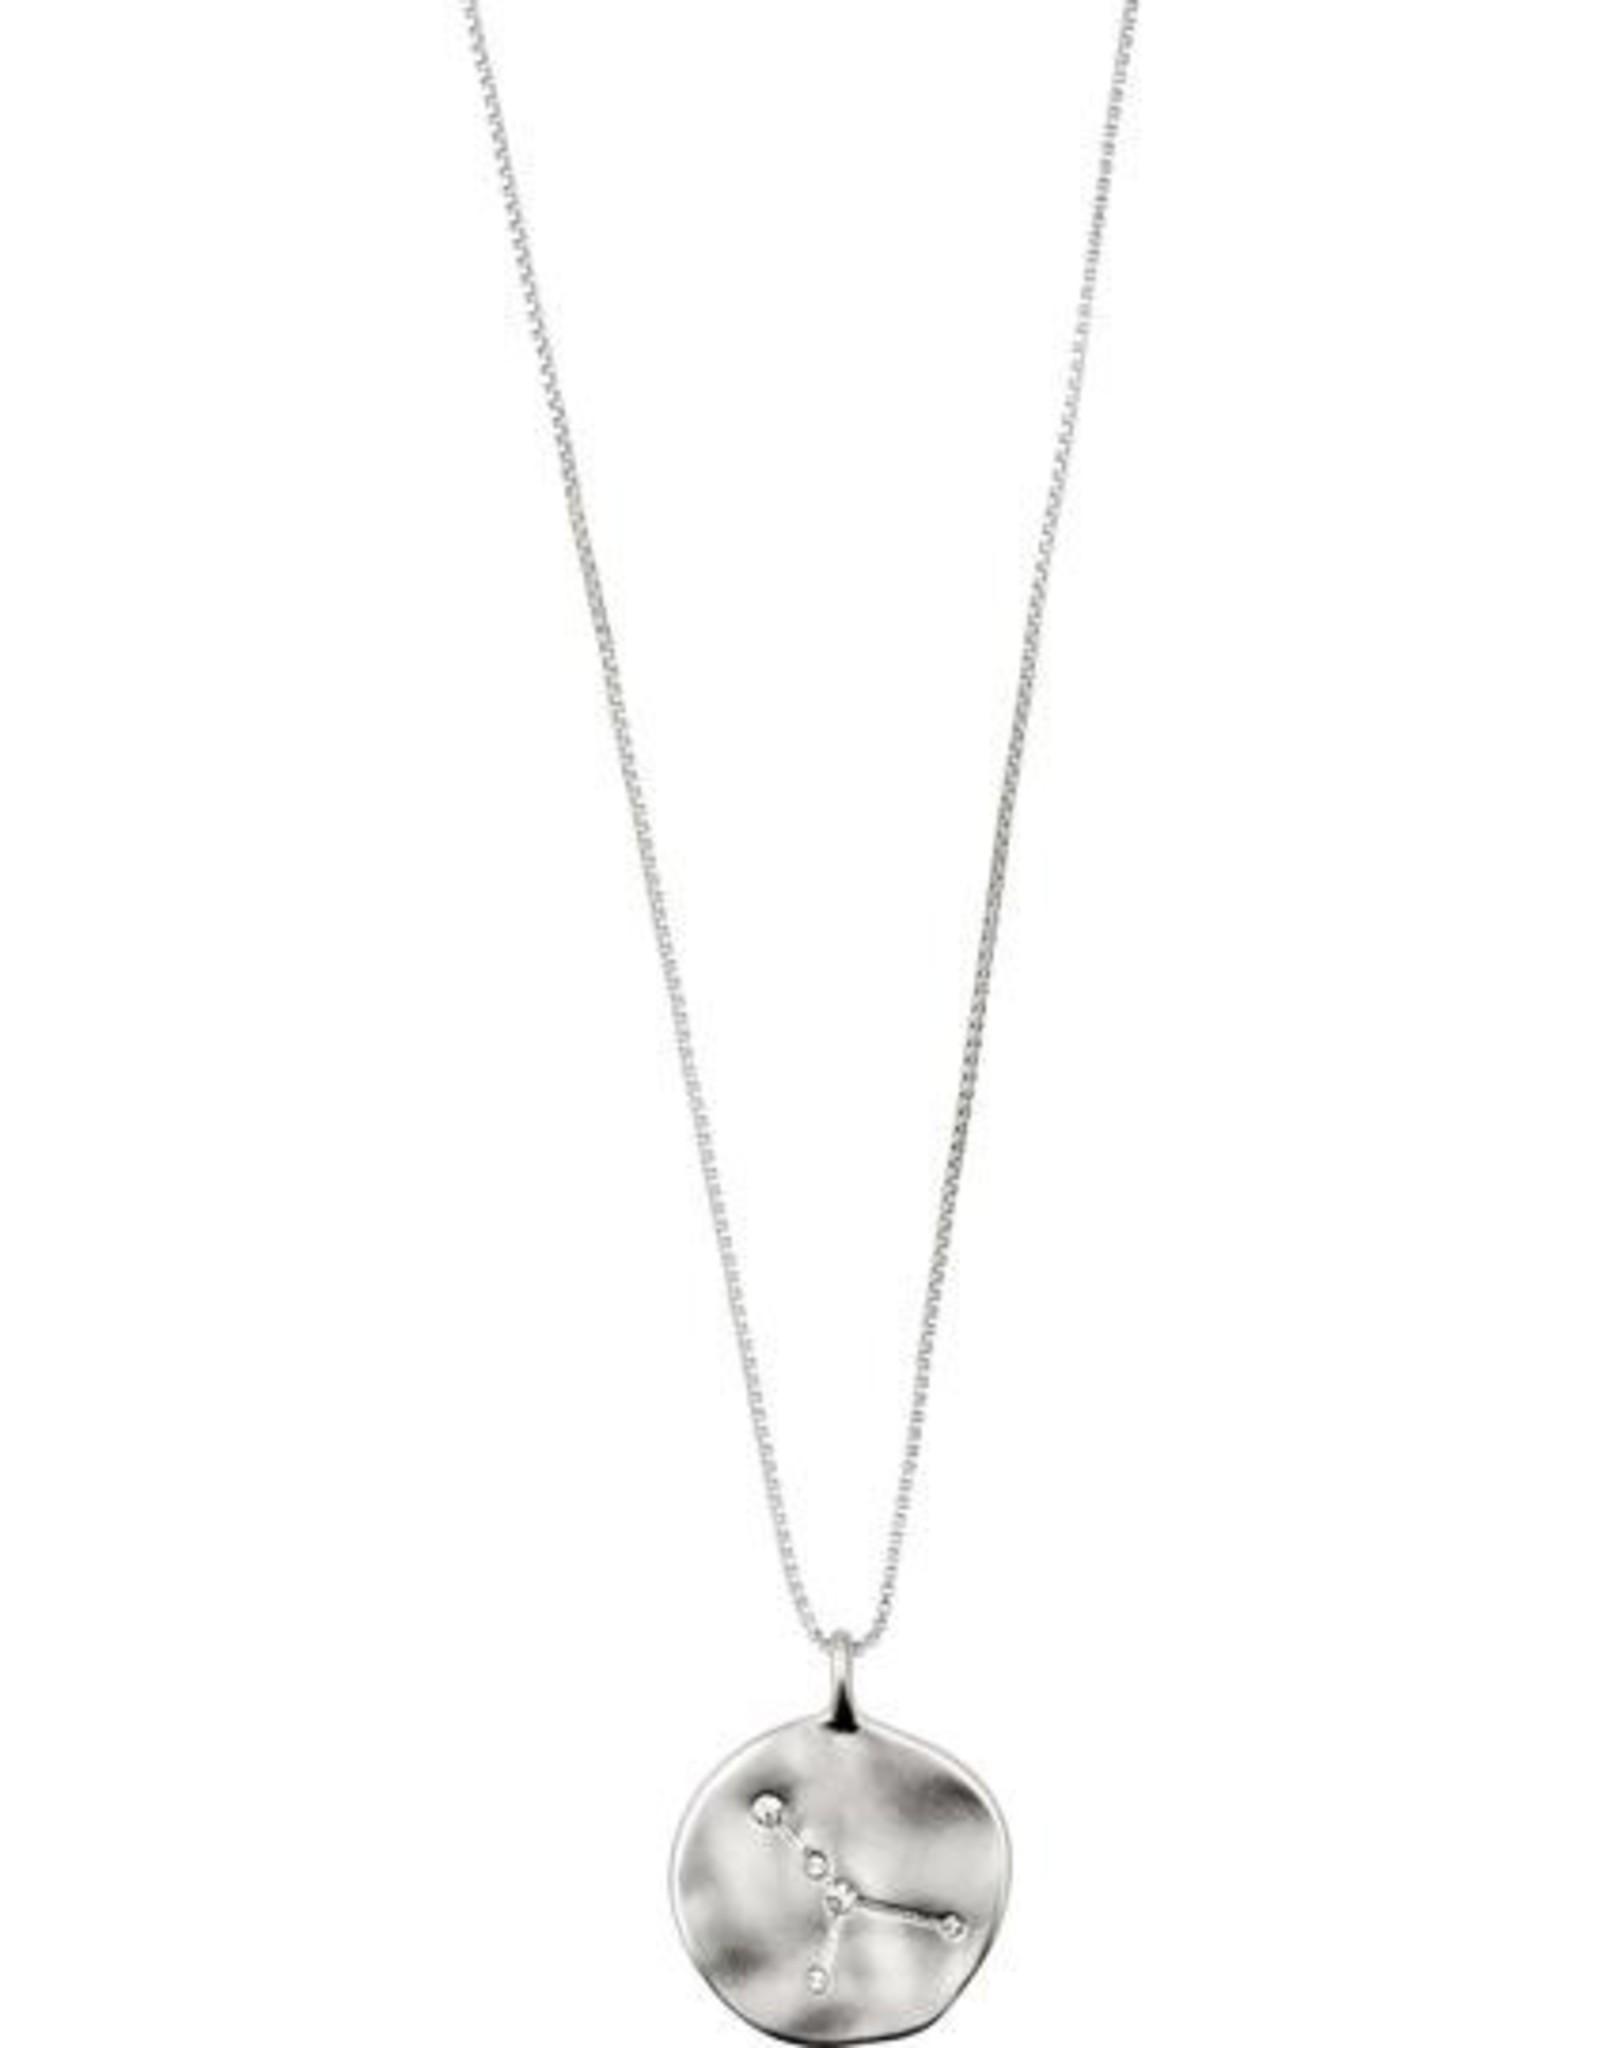 Pilgrim Astrological Necklace - Silver